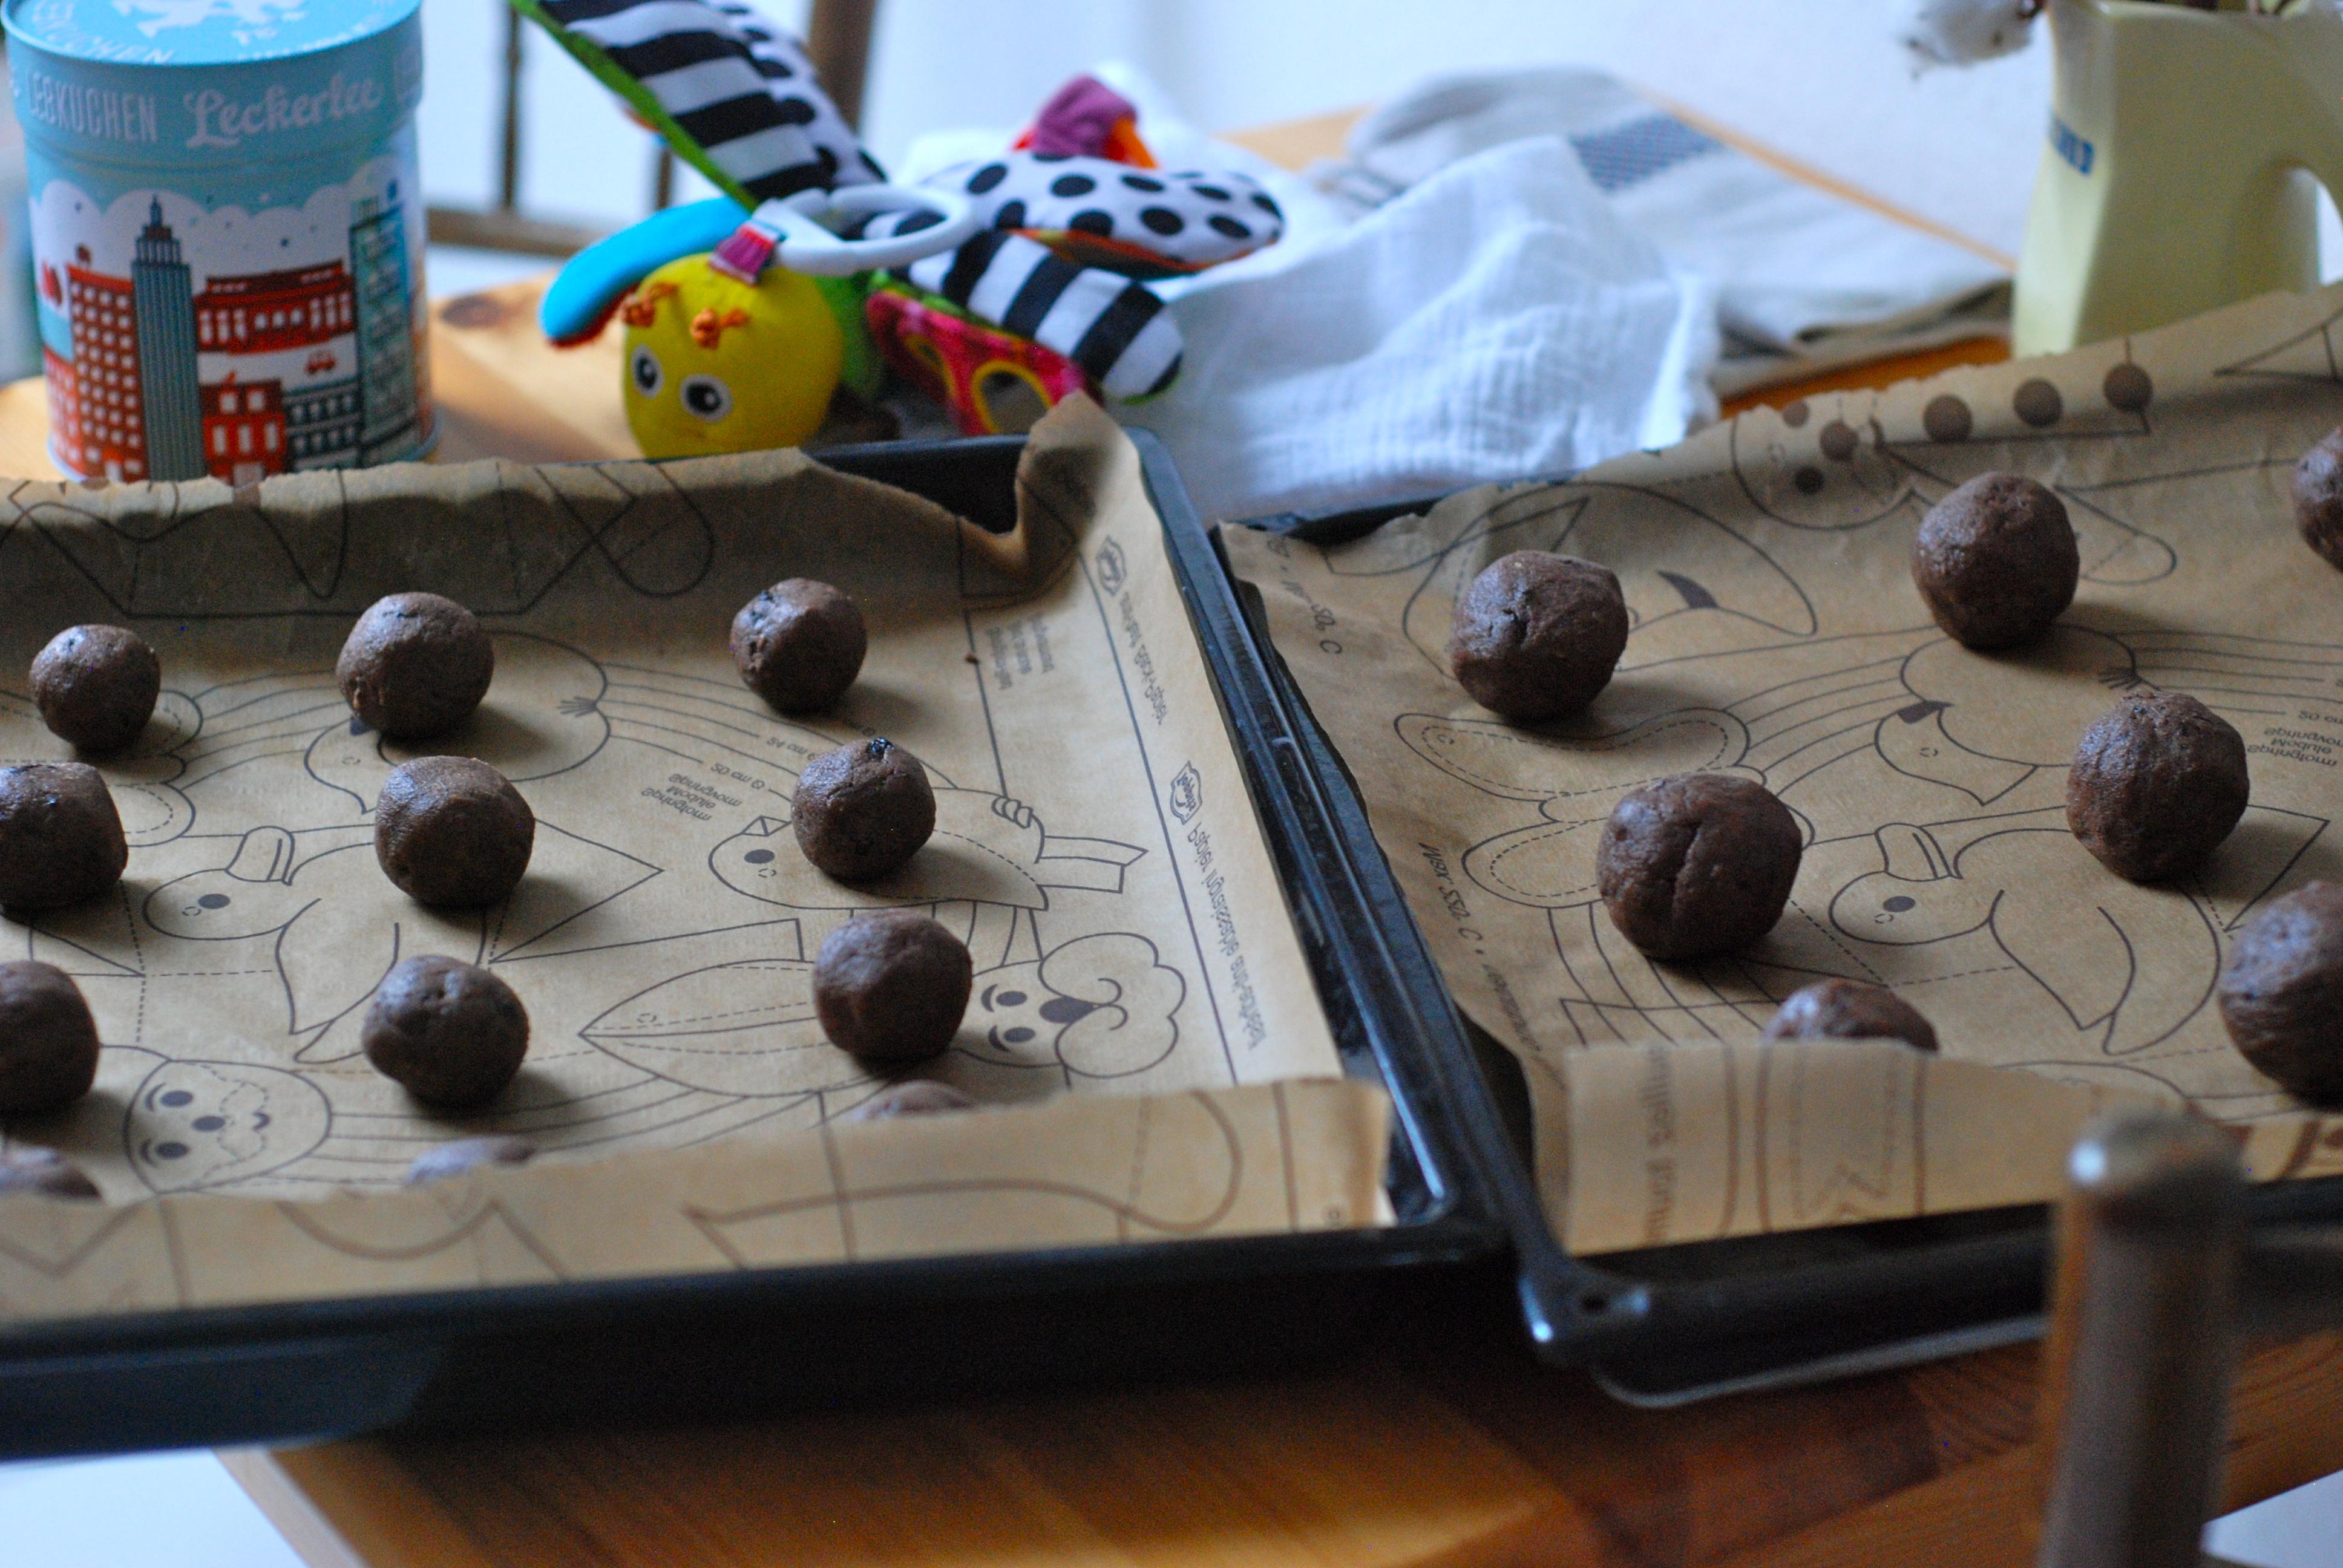 The Wednesday Chef Holidays And Celebrations Aaist Whole Hazelnut Milk Chocolate 100 Gram Balls